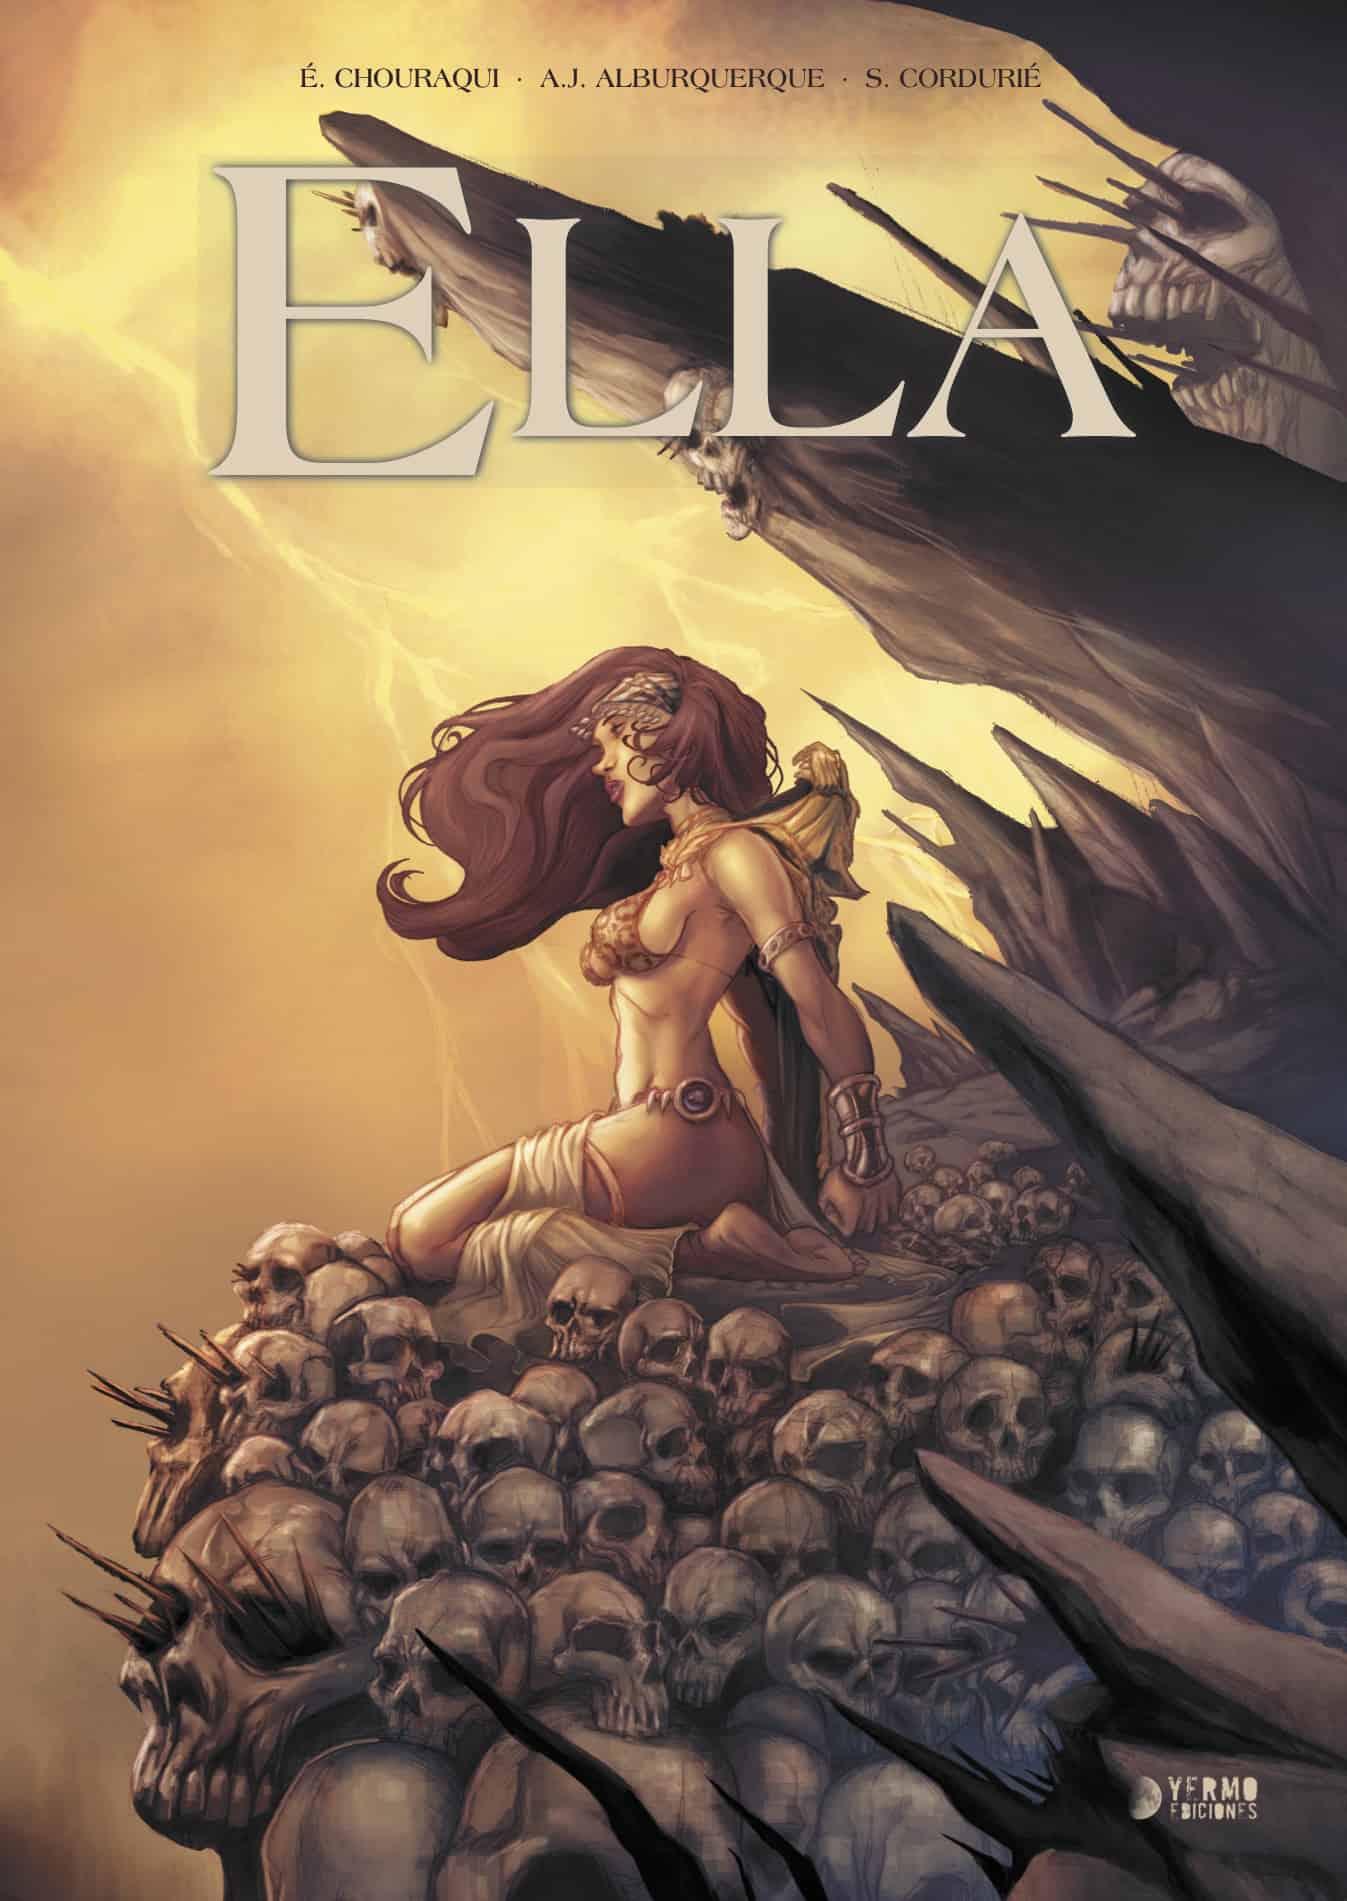 ELLA (EDICION INTEGRAL)